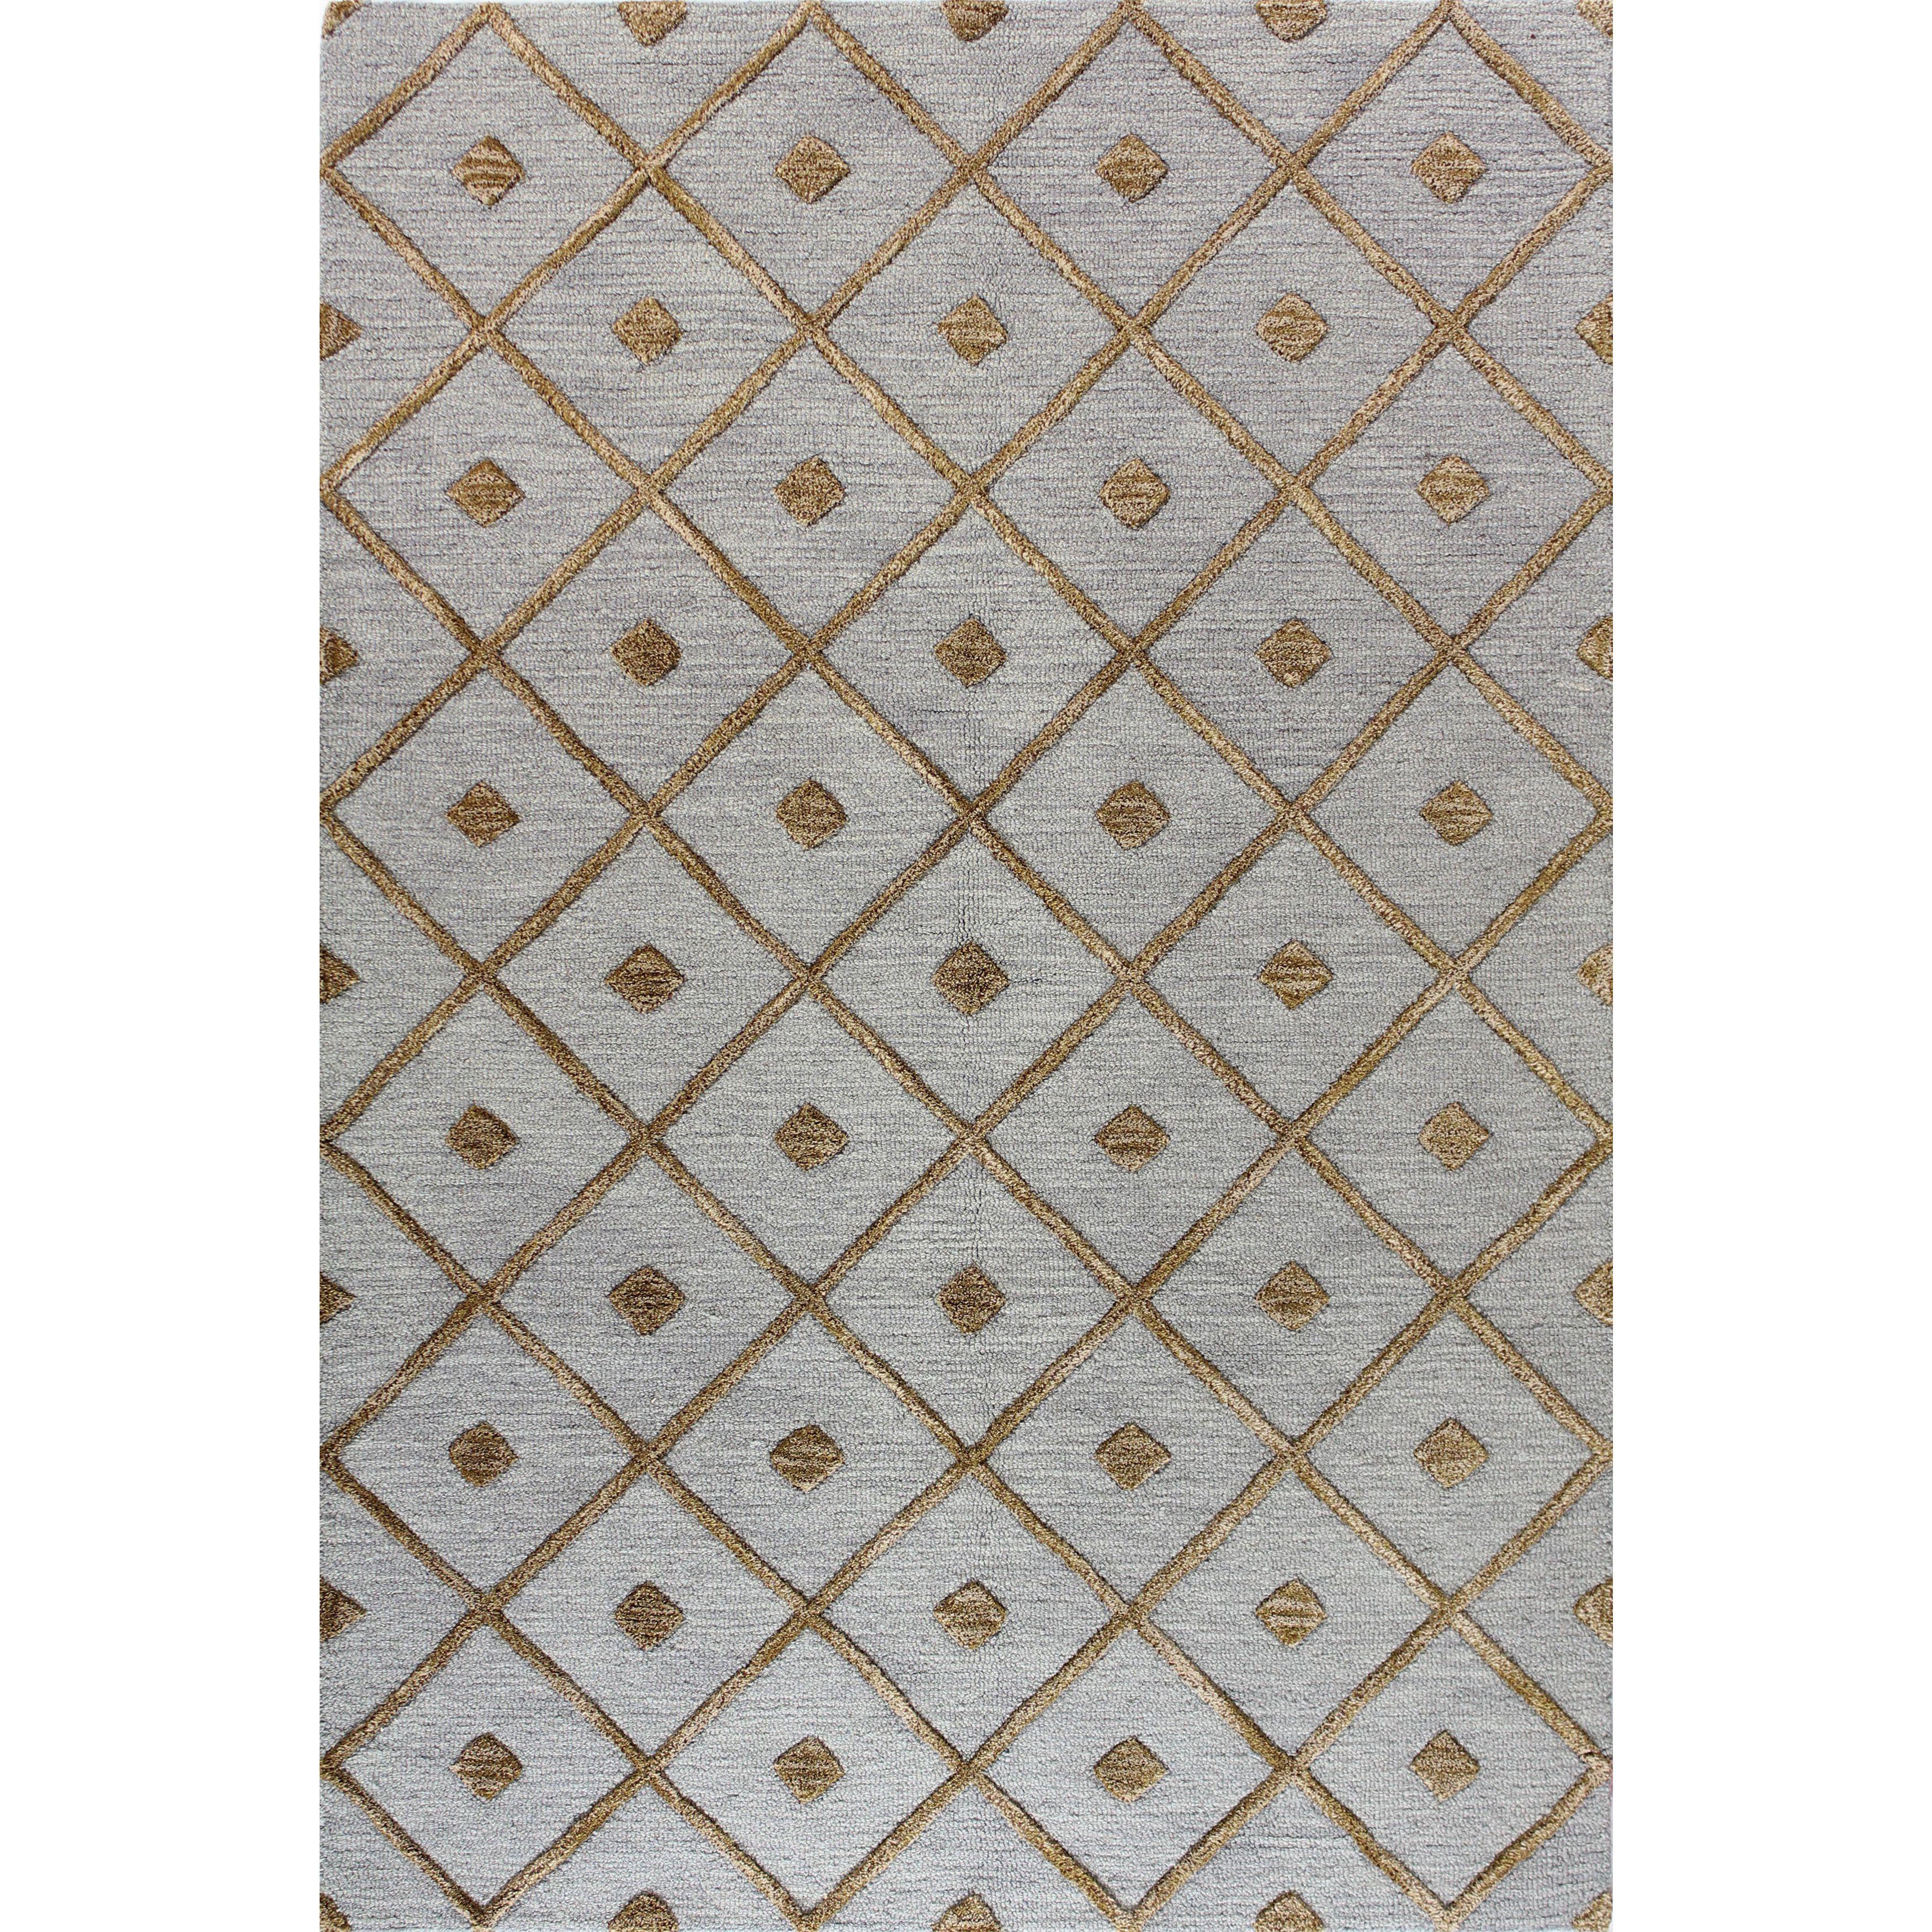 Caitlin Blue/Black/Brown Cotton Tufted Area Rug 4' X 6' (